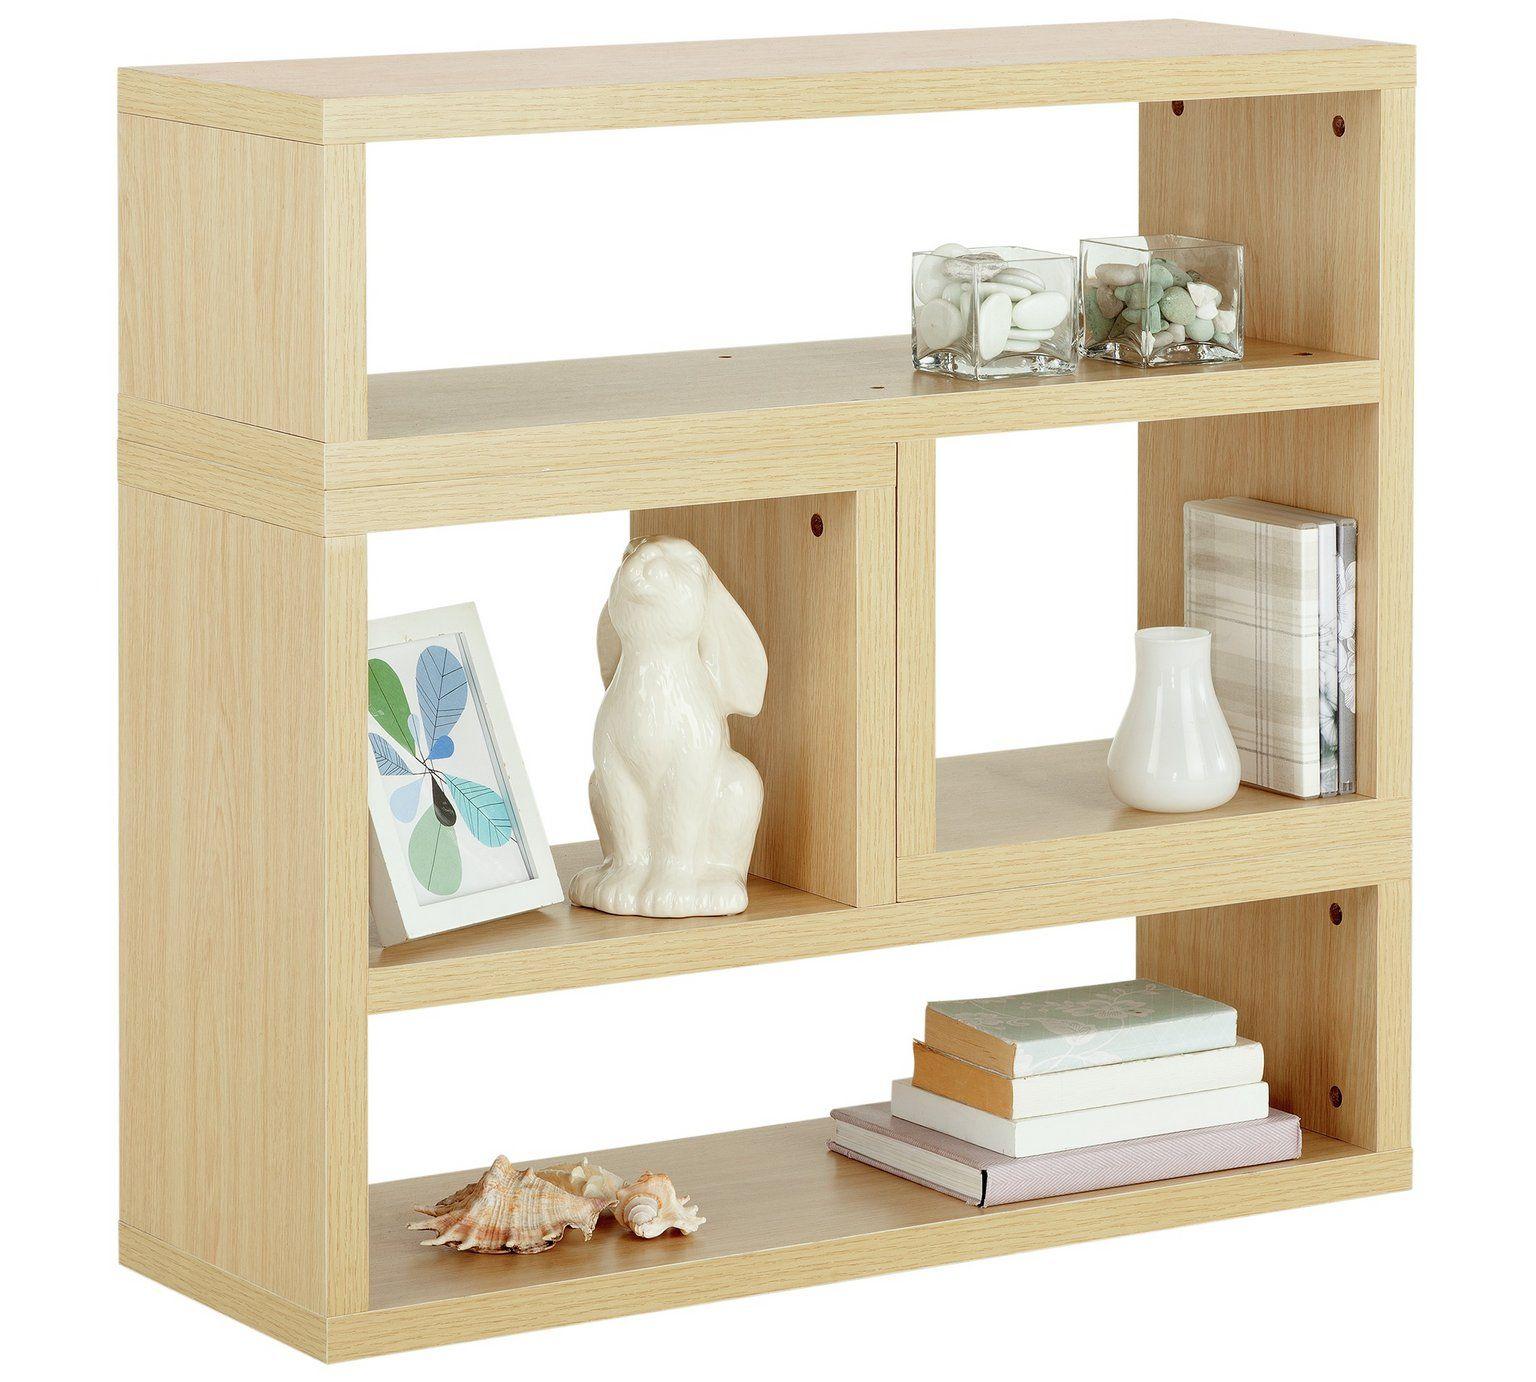 Buy Home Oscar 2 Shelf Set Of 2 L Storage Units Oak Effect At Argos Co Uk Visit Argos Co Uk To Shop Online For Boo Argos Home Bookcase Living Room Furniture